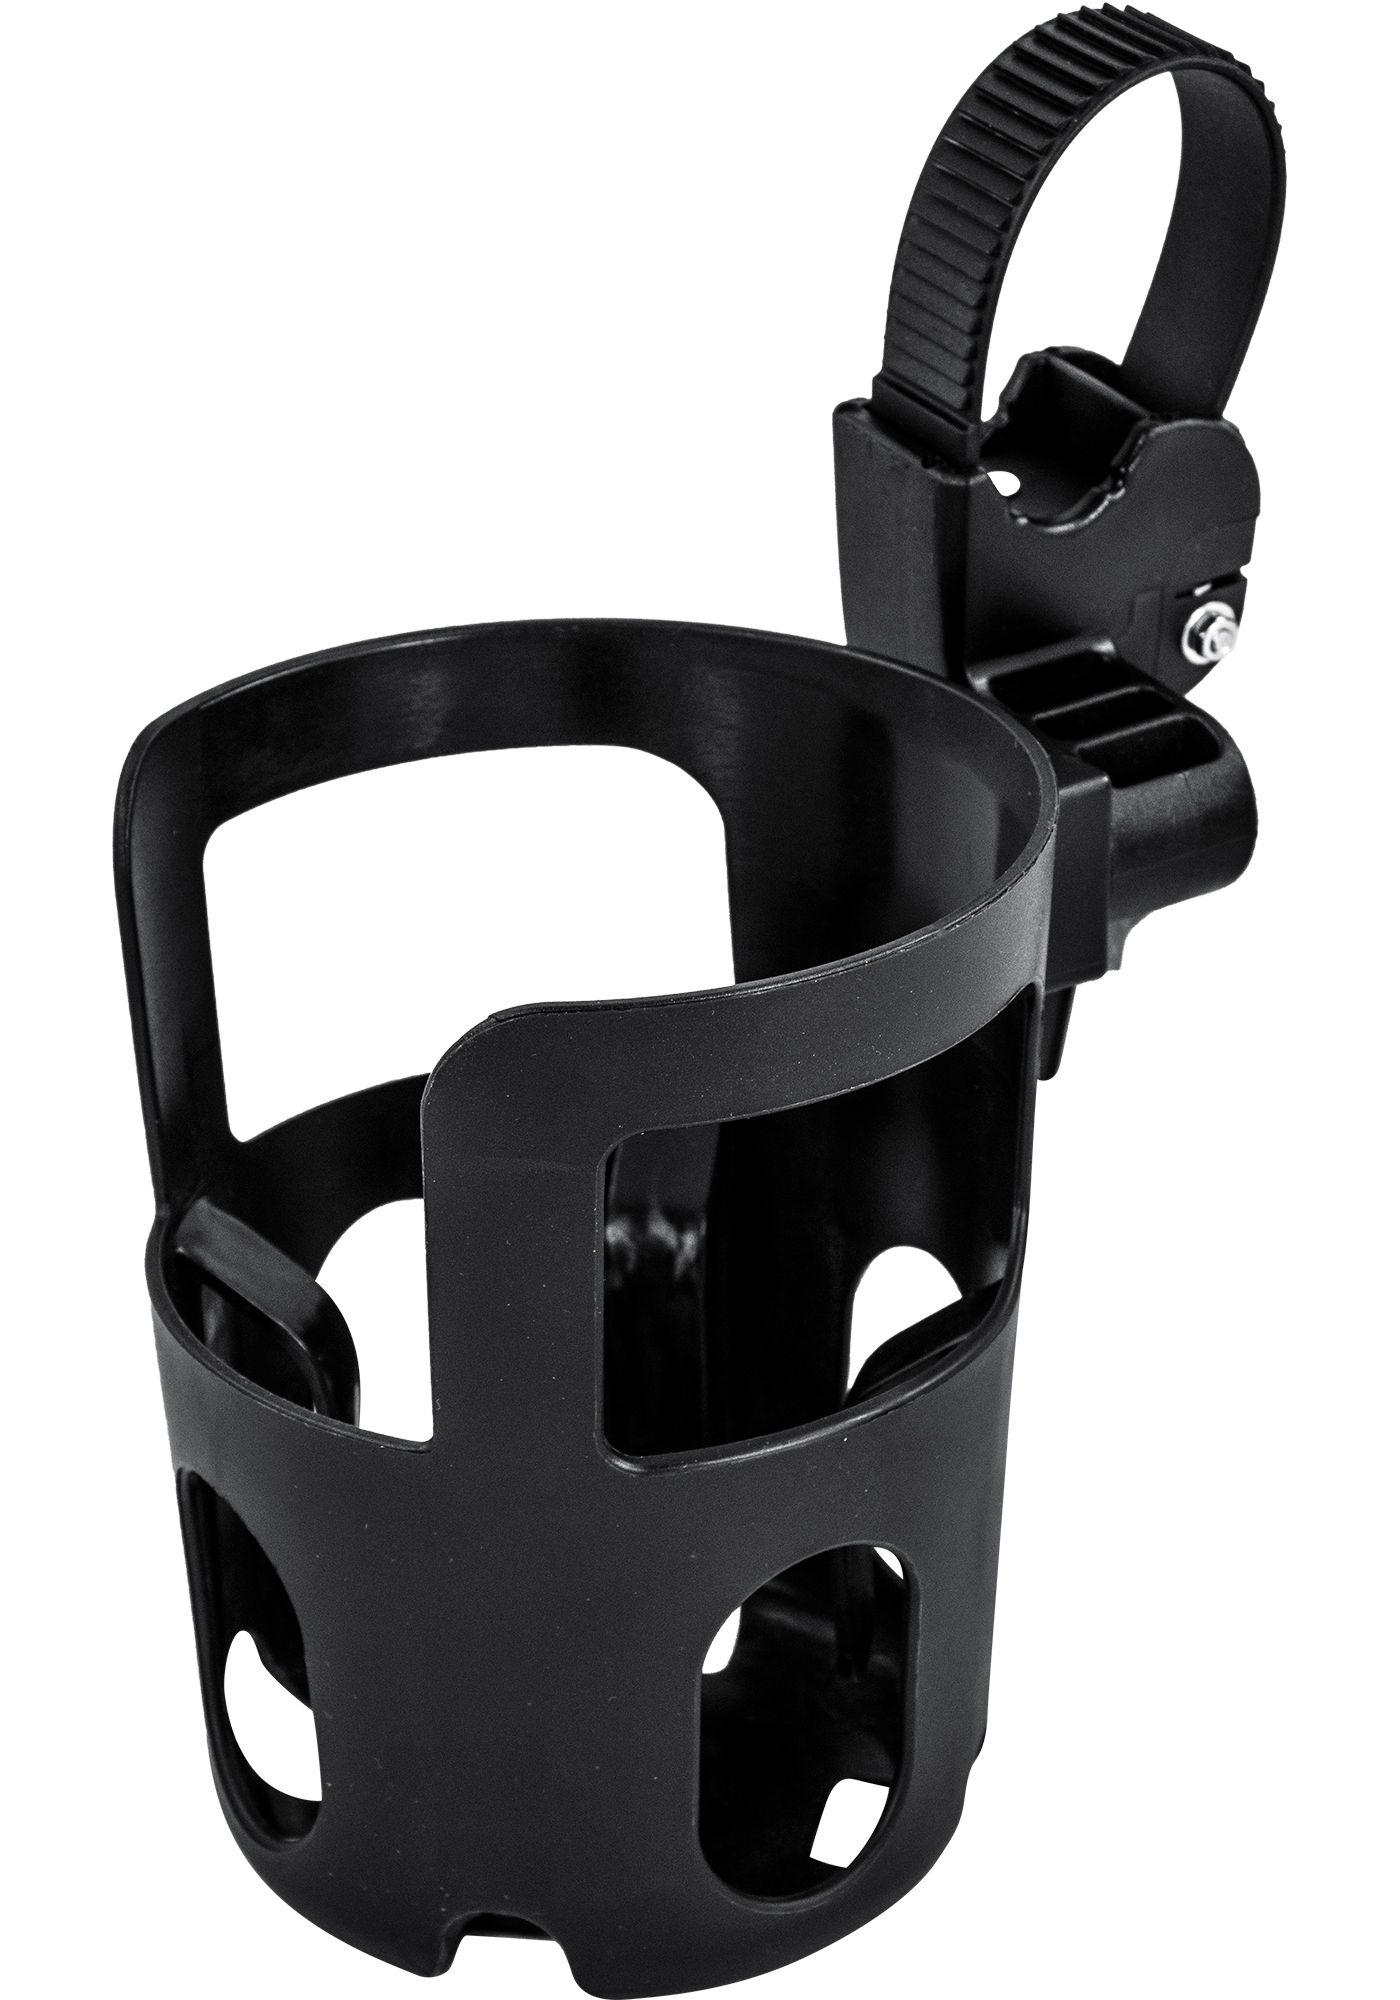 Maxfli Universal Golf Cart Water Bottle Holder